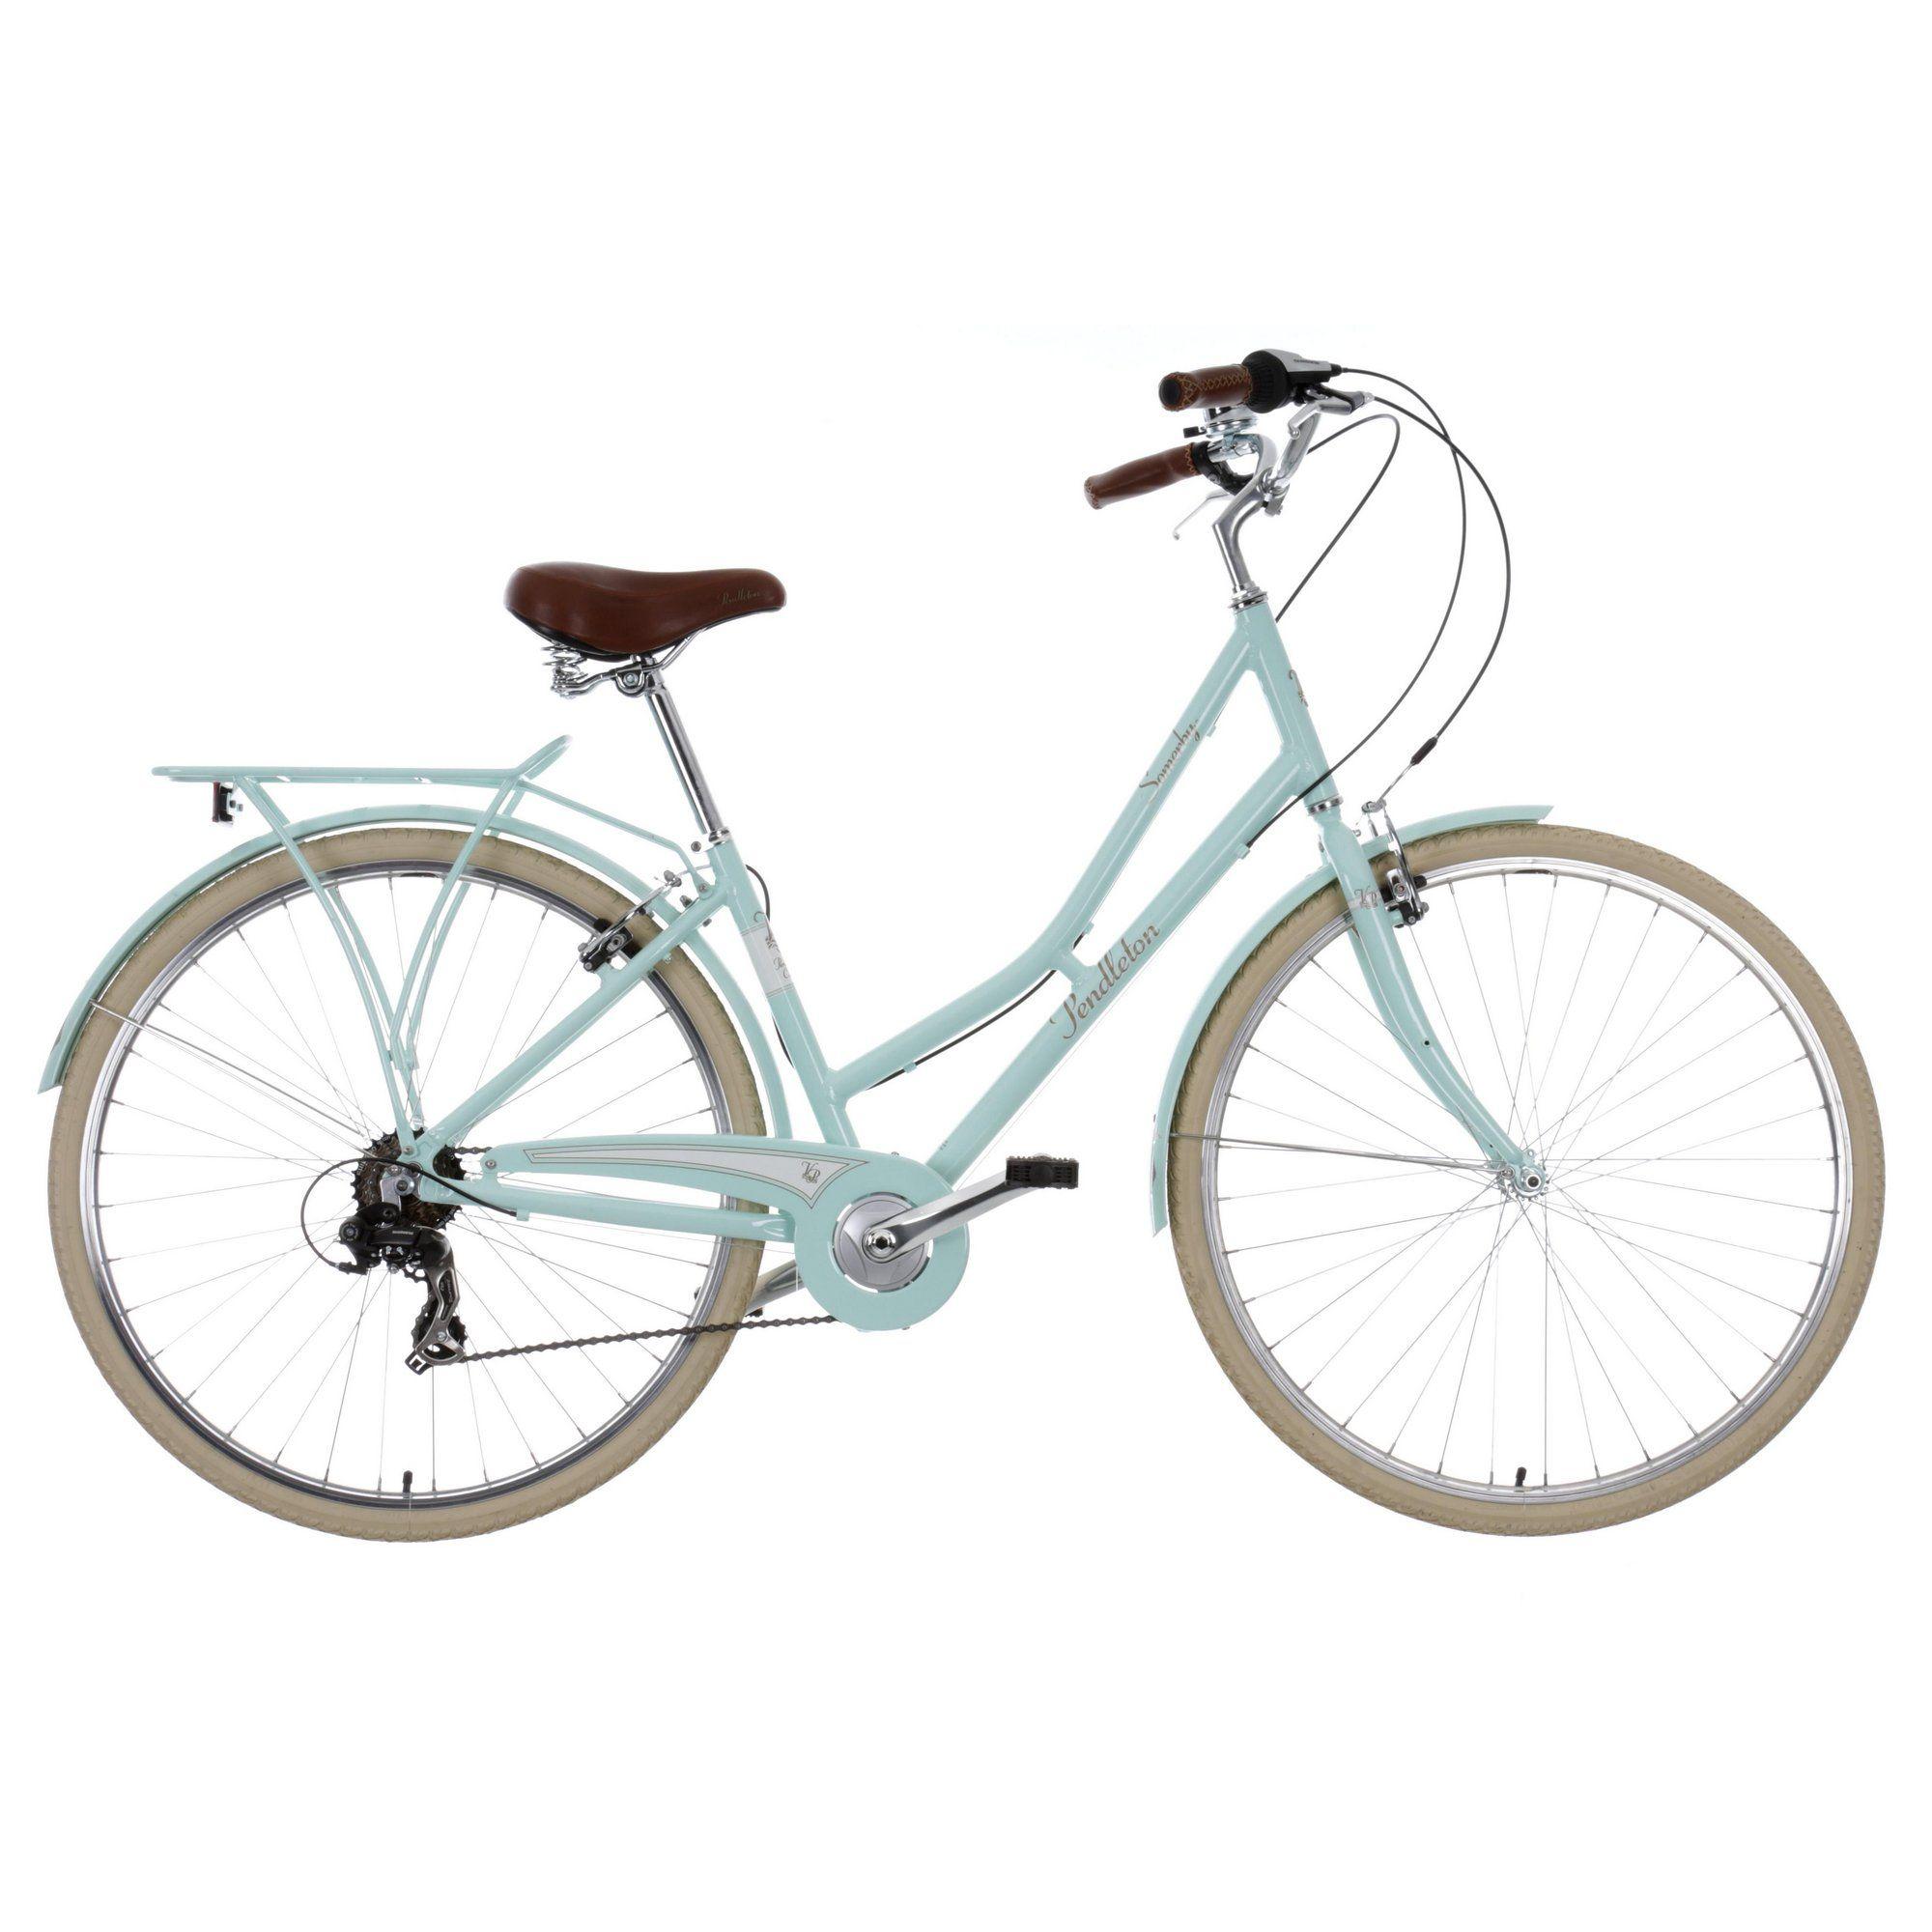 Halfords Pendleton Somerby Limited Edition Hybrid Bike Mint A